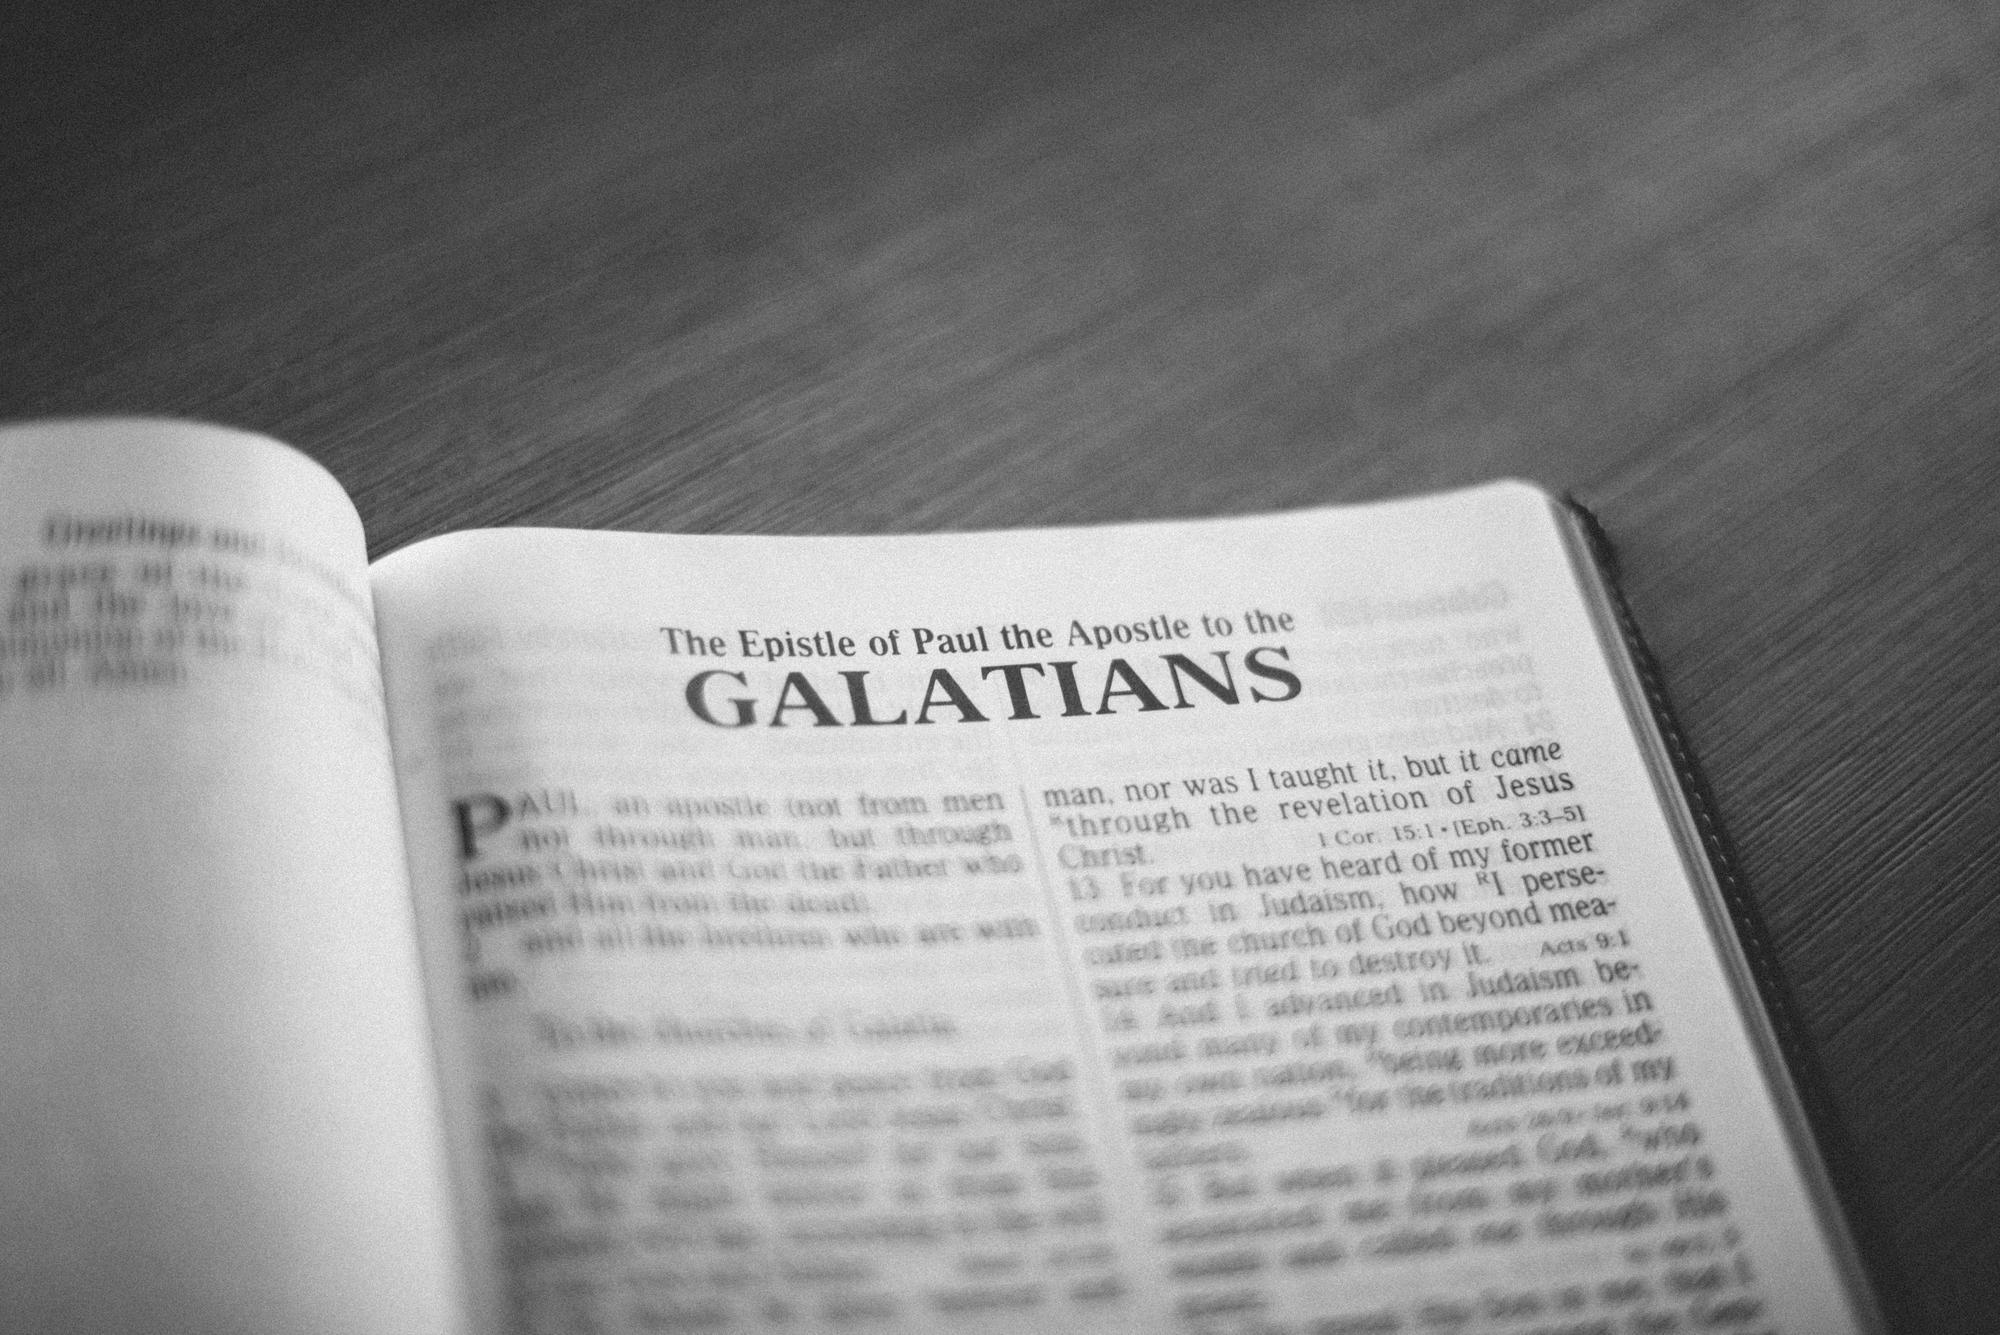 49488_Galatians.jpg